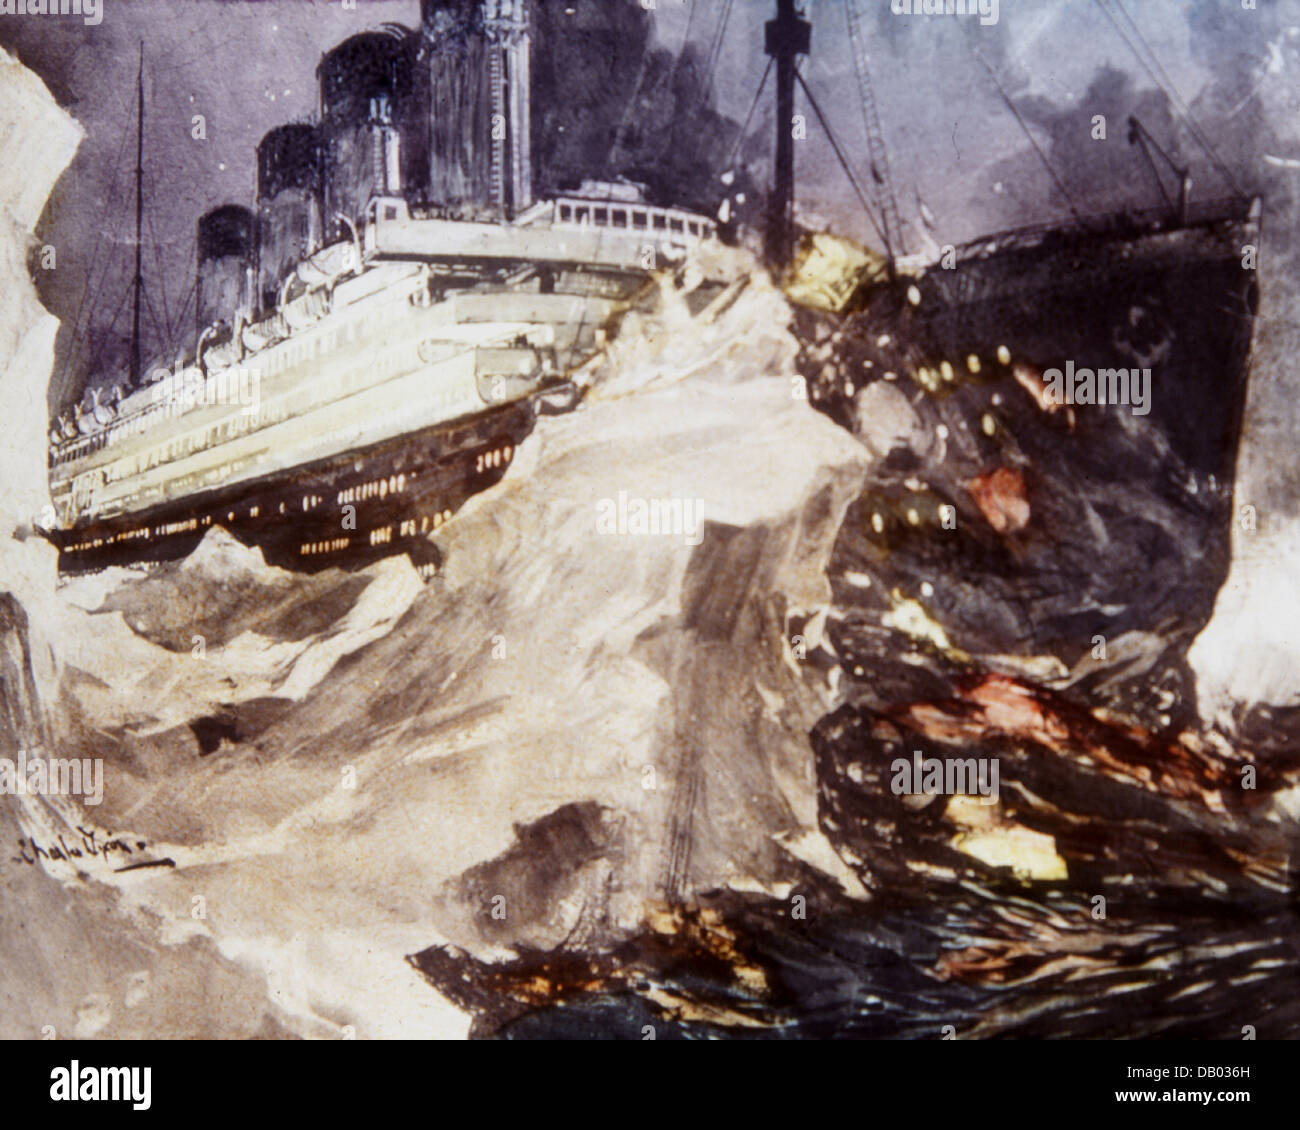 The Loss of the Titanic Magic Lantern Slide 1912 - Stock Image